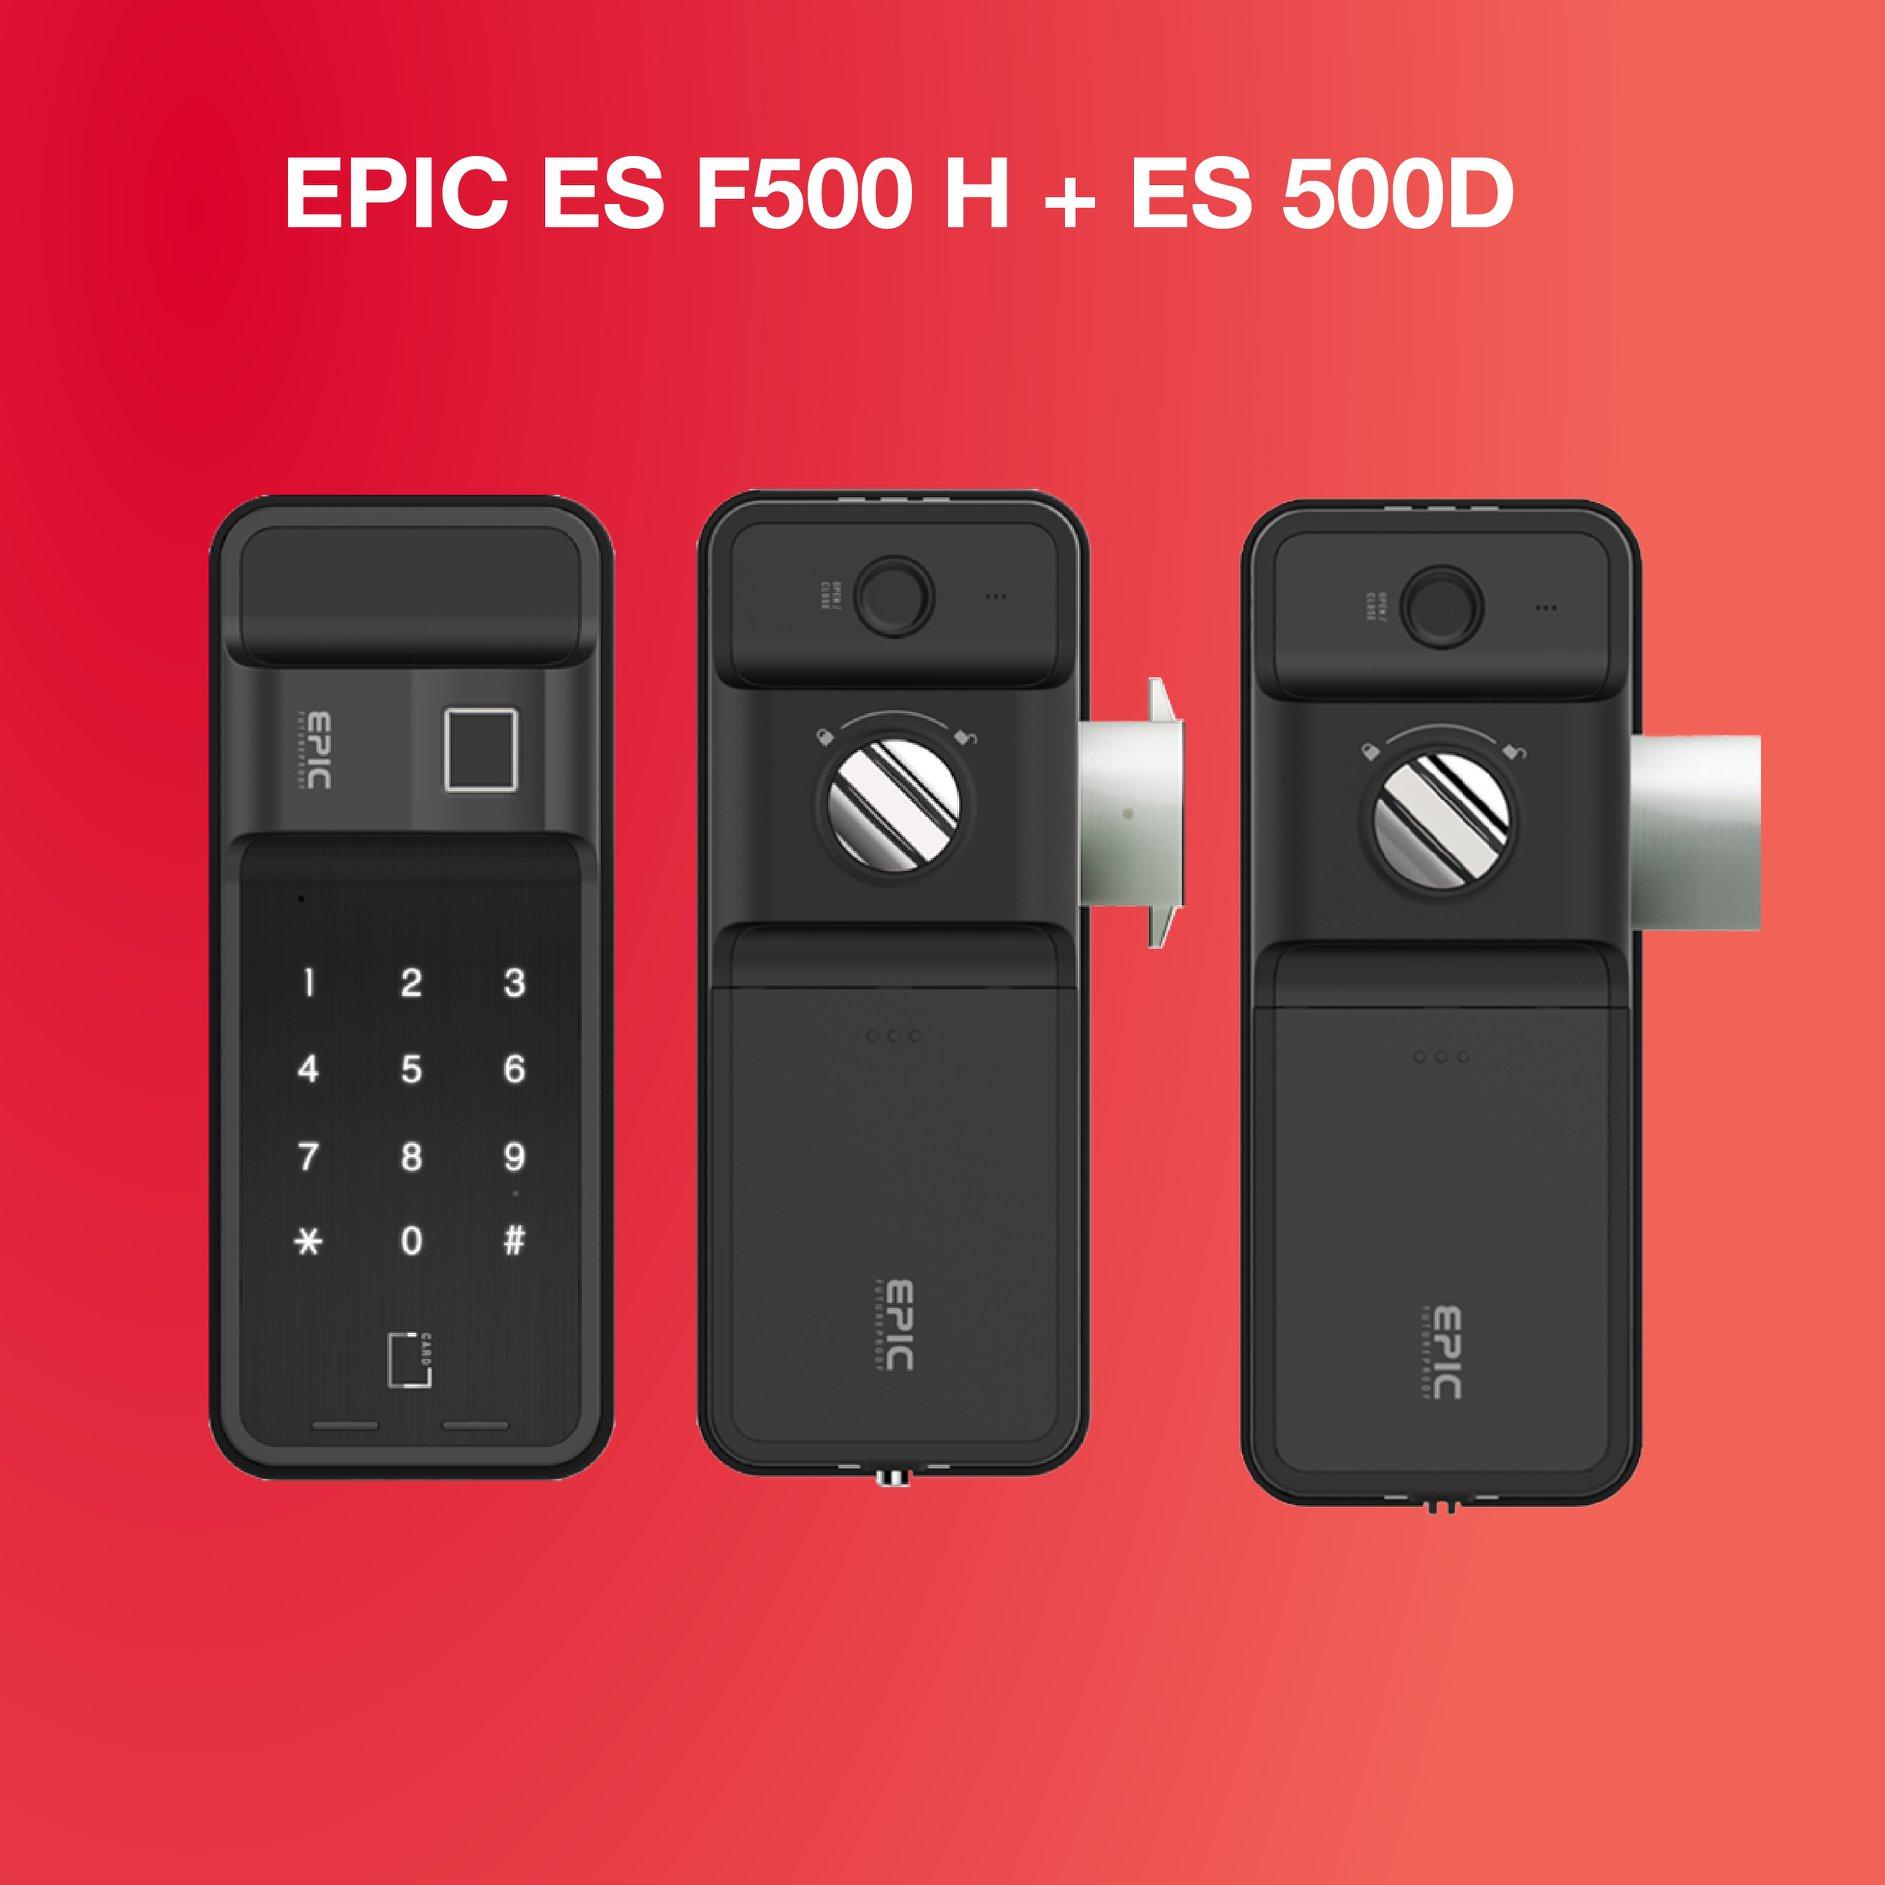 khoa-dien-tu-epic-es-f500